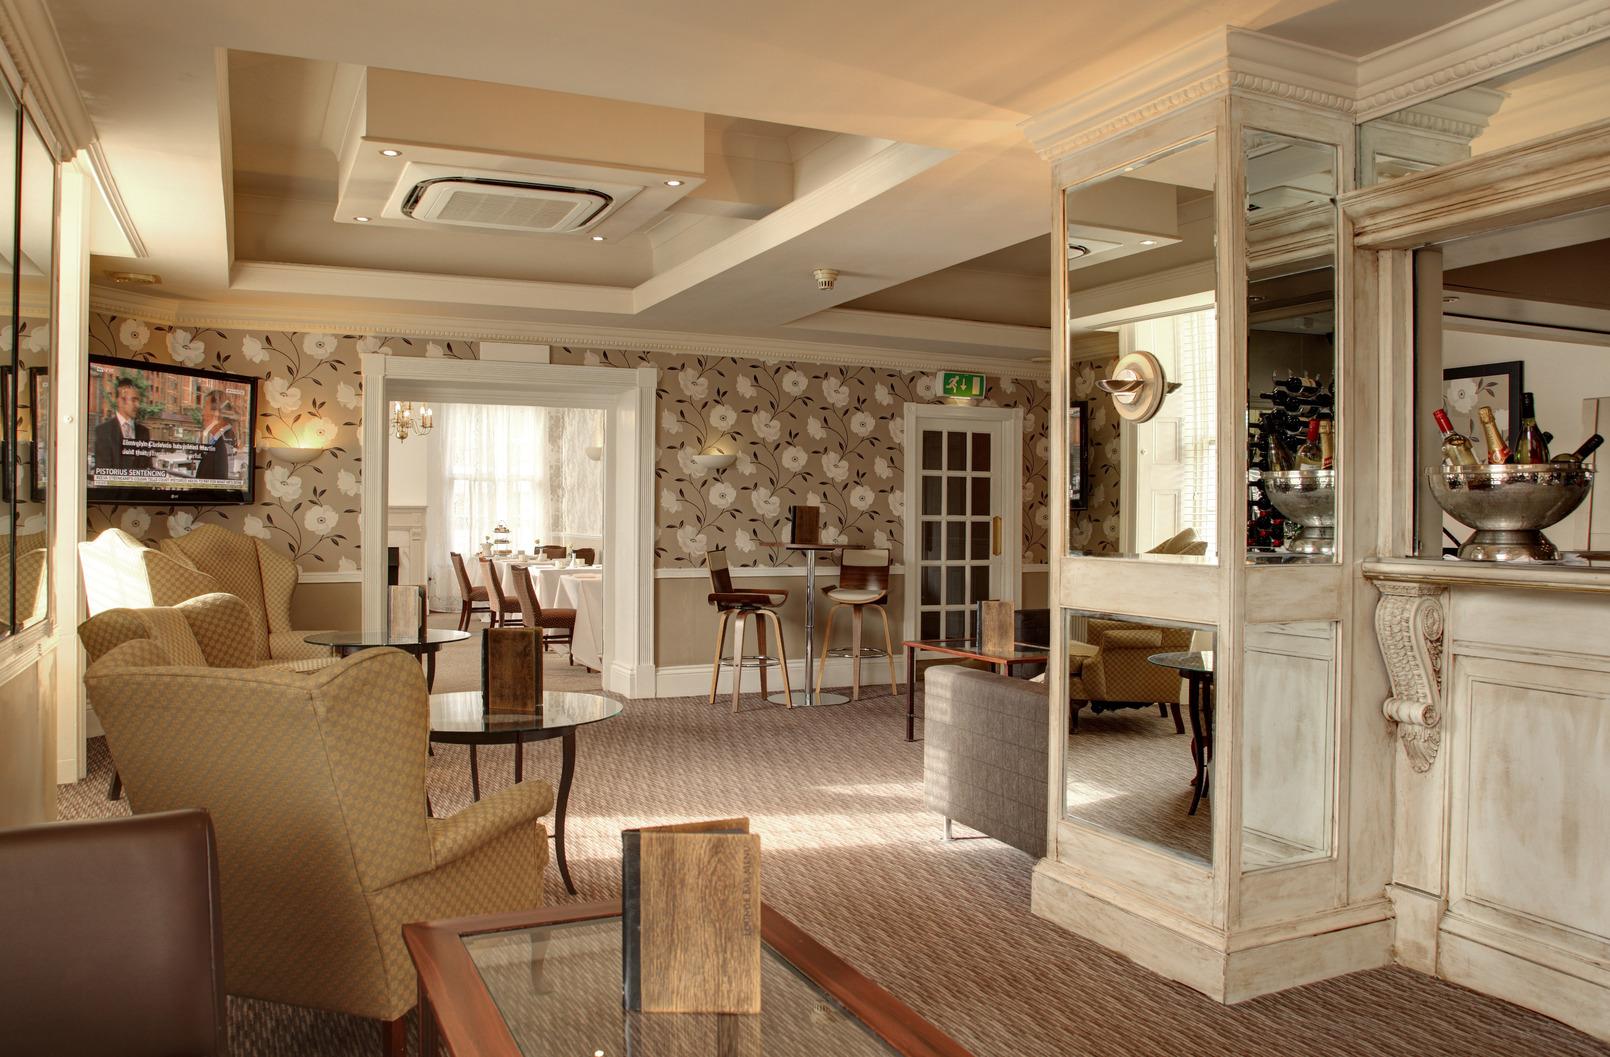 Best Western Grosvenor Hotel Stratford Upon Avon Uk